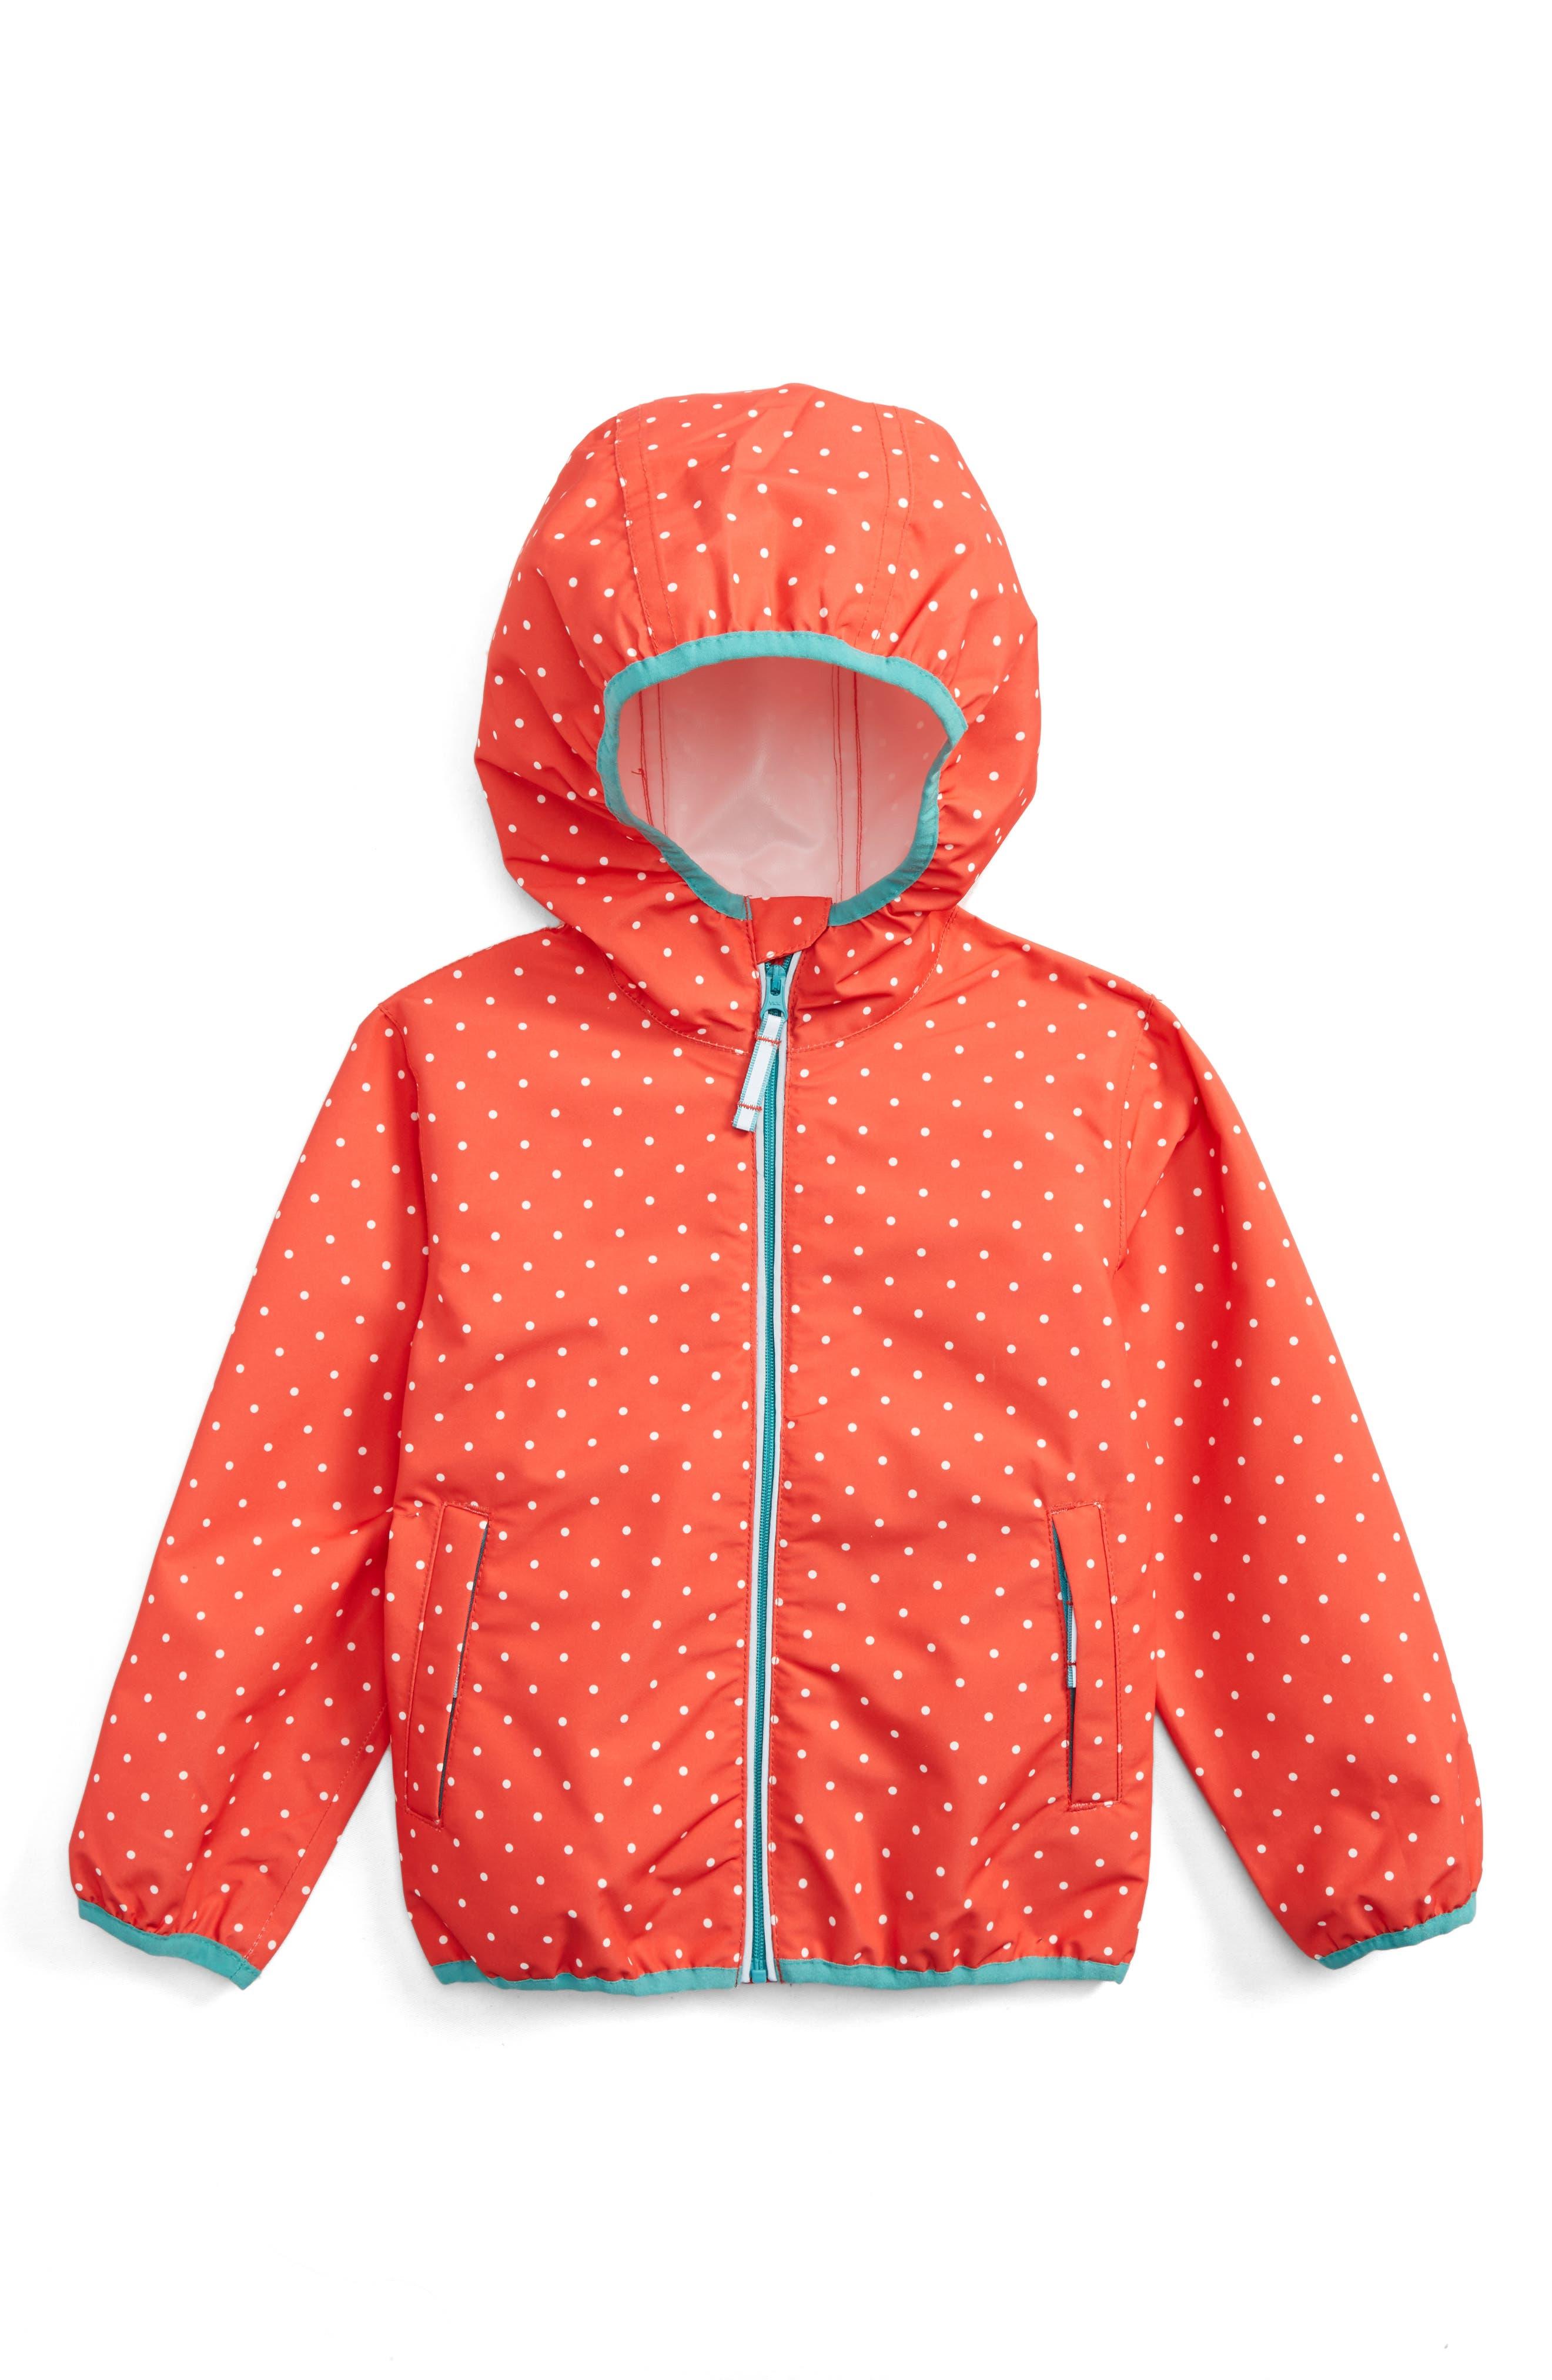 Packaway Waterproof Jacket,                         Main,                         color, Red Jam Pin Spot